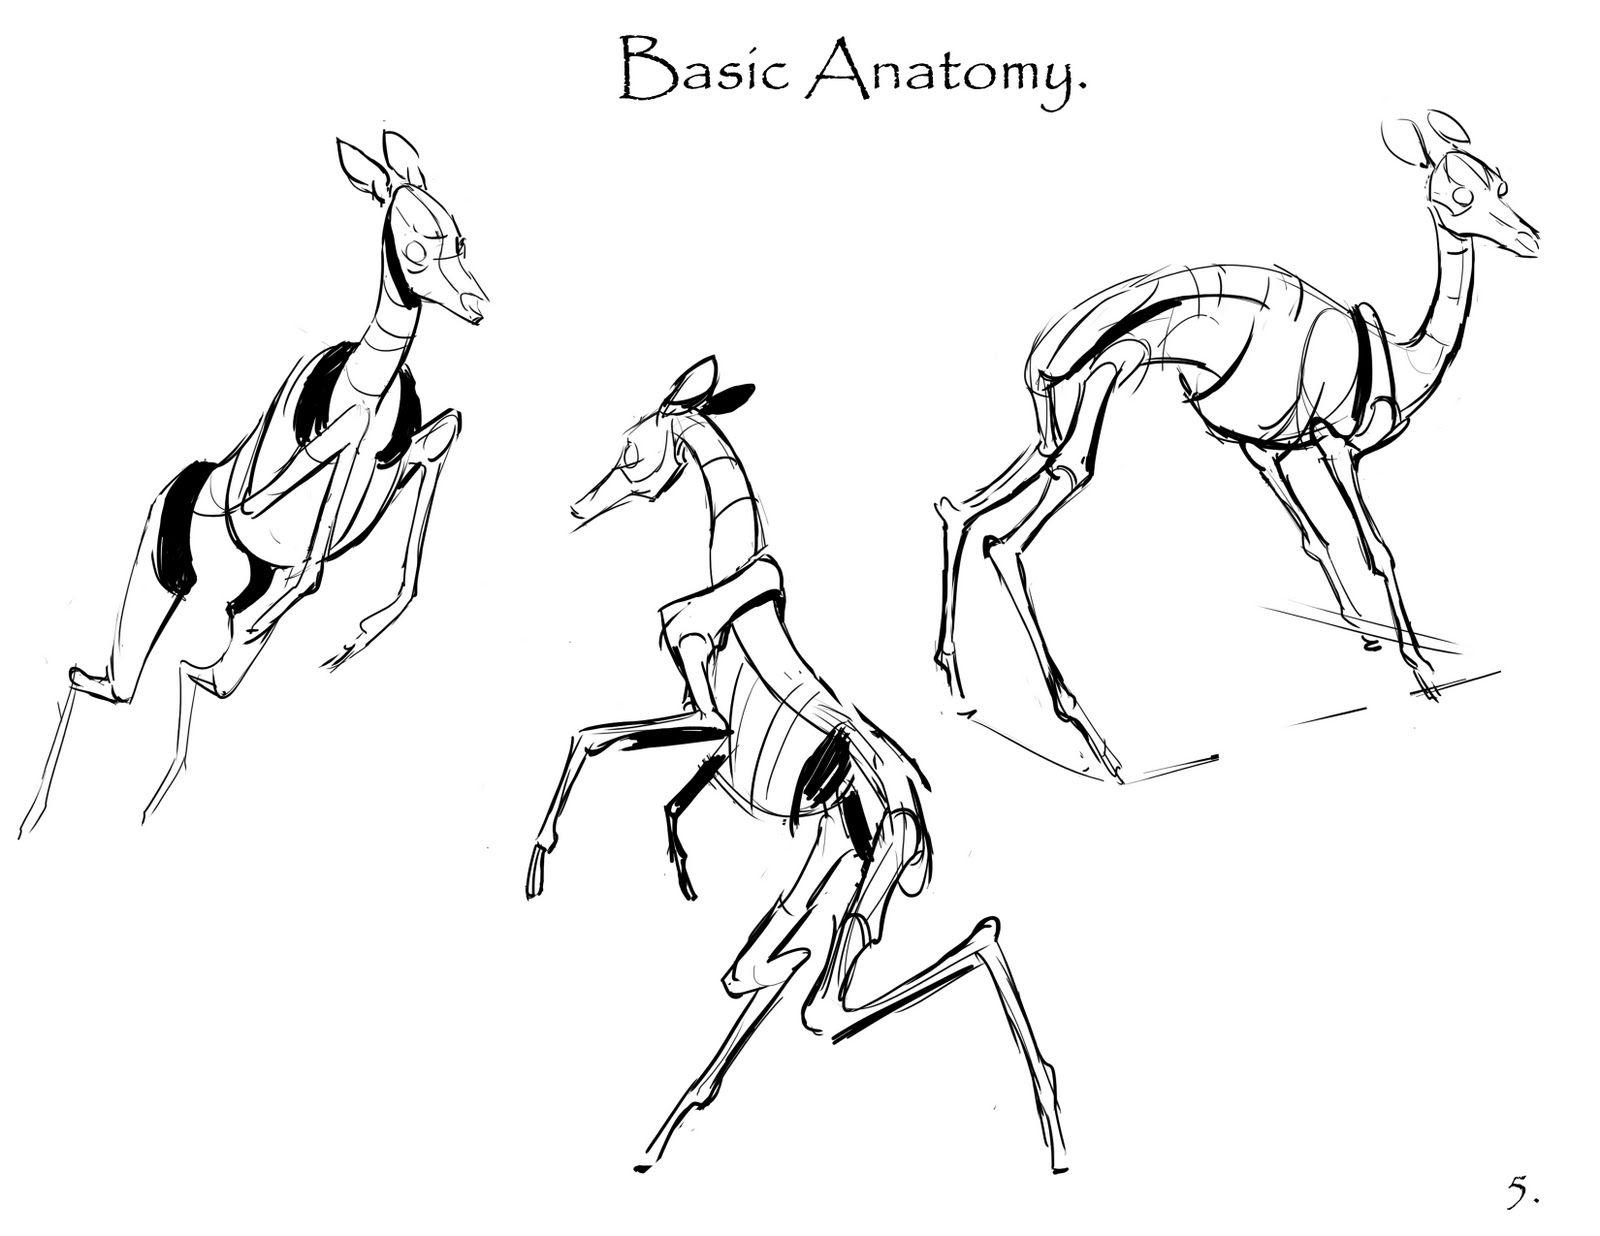 Pin by Zandra Hoffman on Animal anatomy | Pinterest | Animal anatomy ...